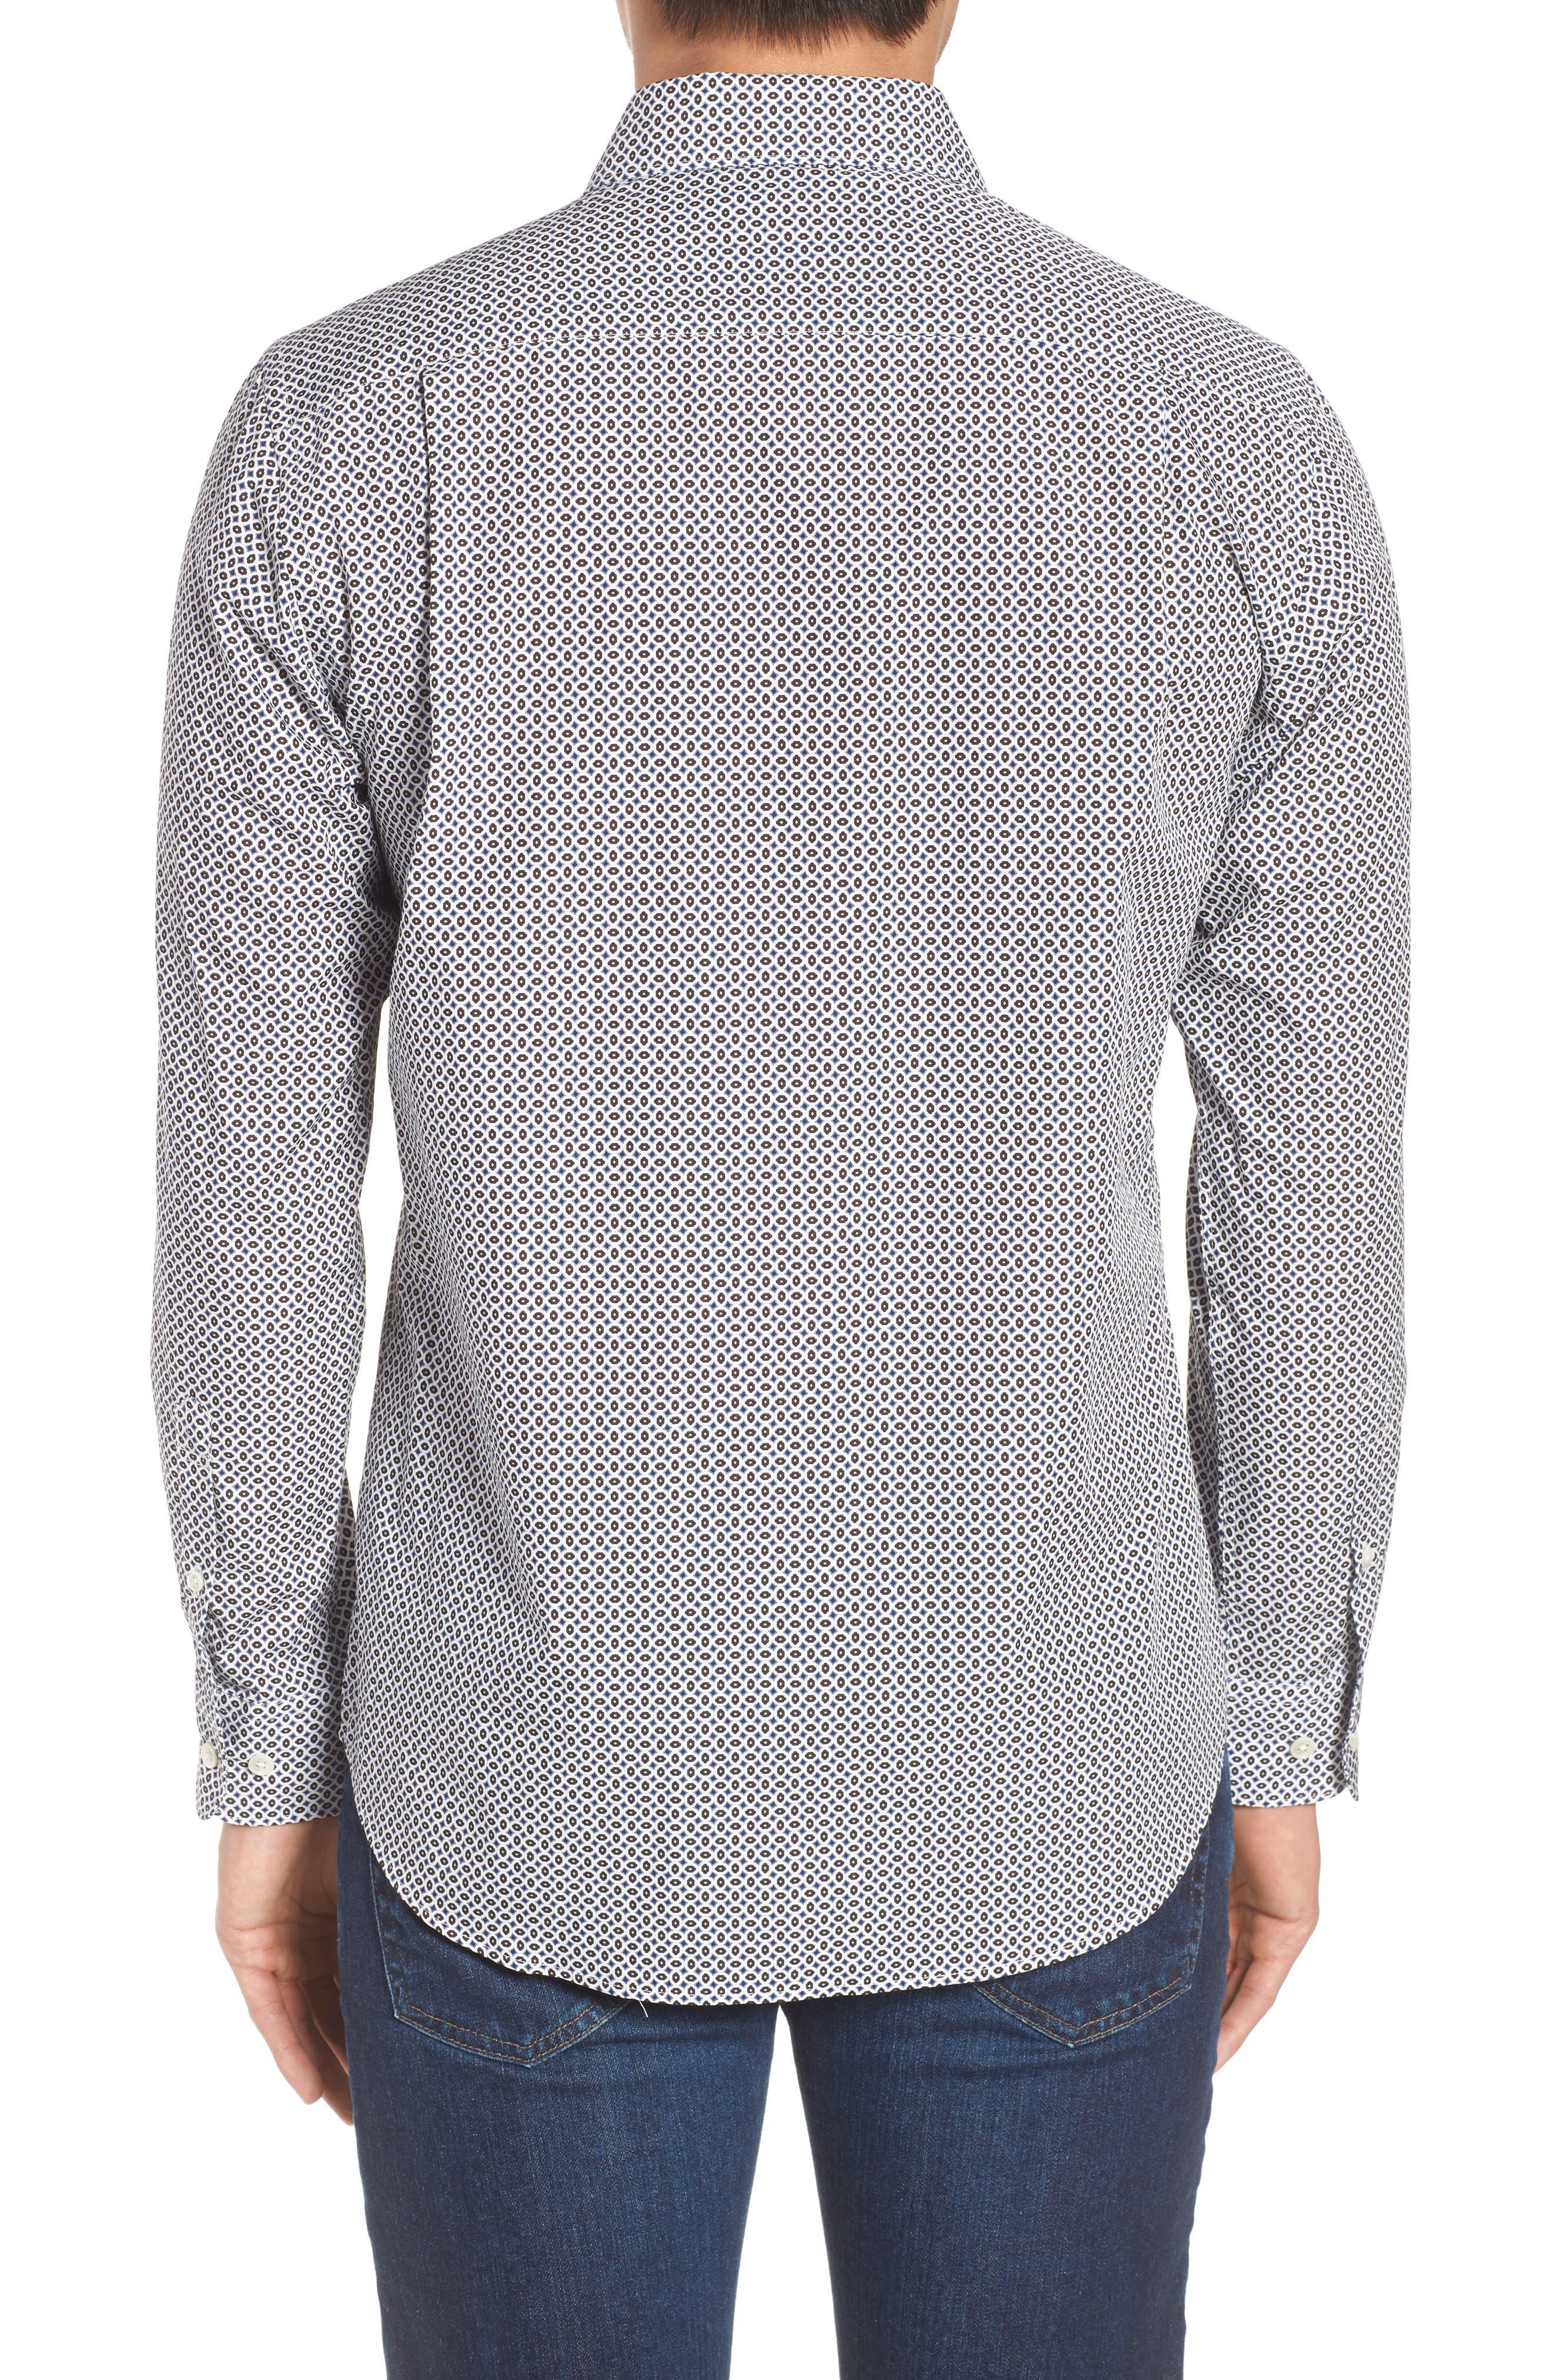 Oak House Regular Fit Sport Shirt,                             Alternate thumbnail 3, color,                             Ivory